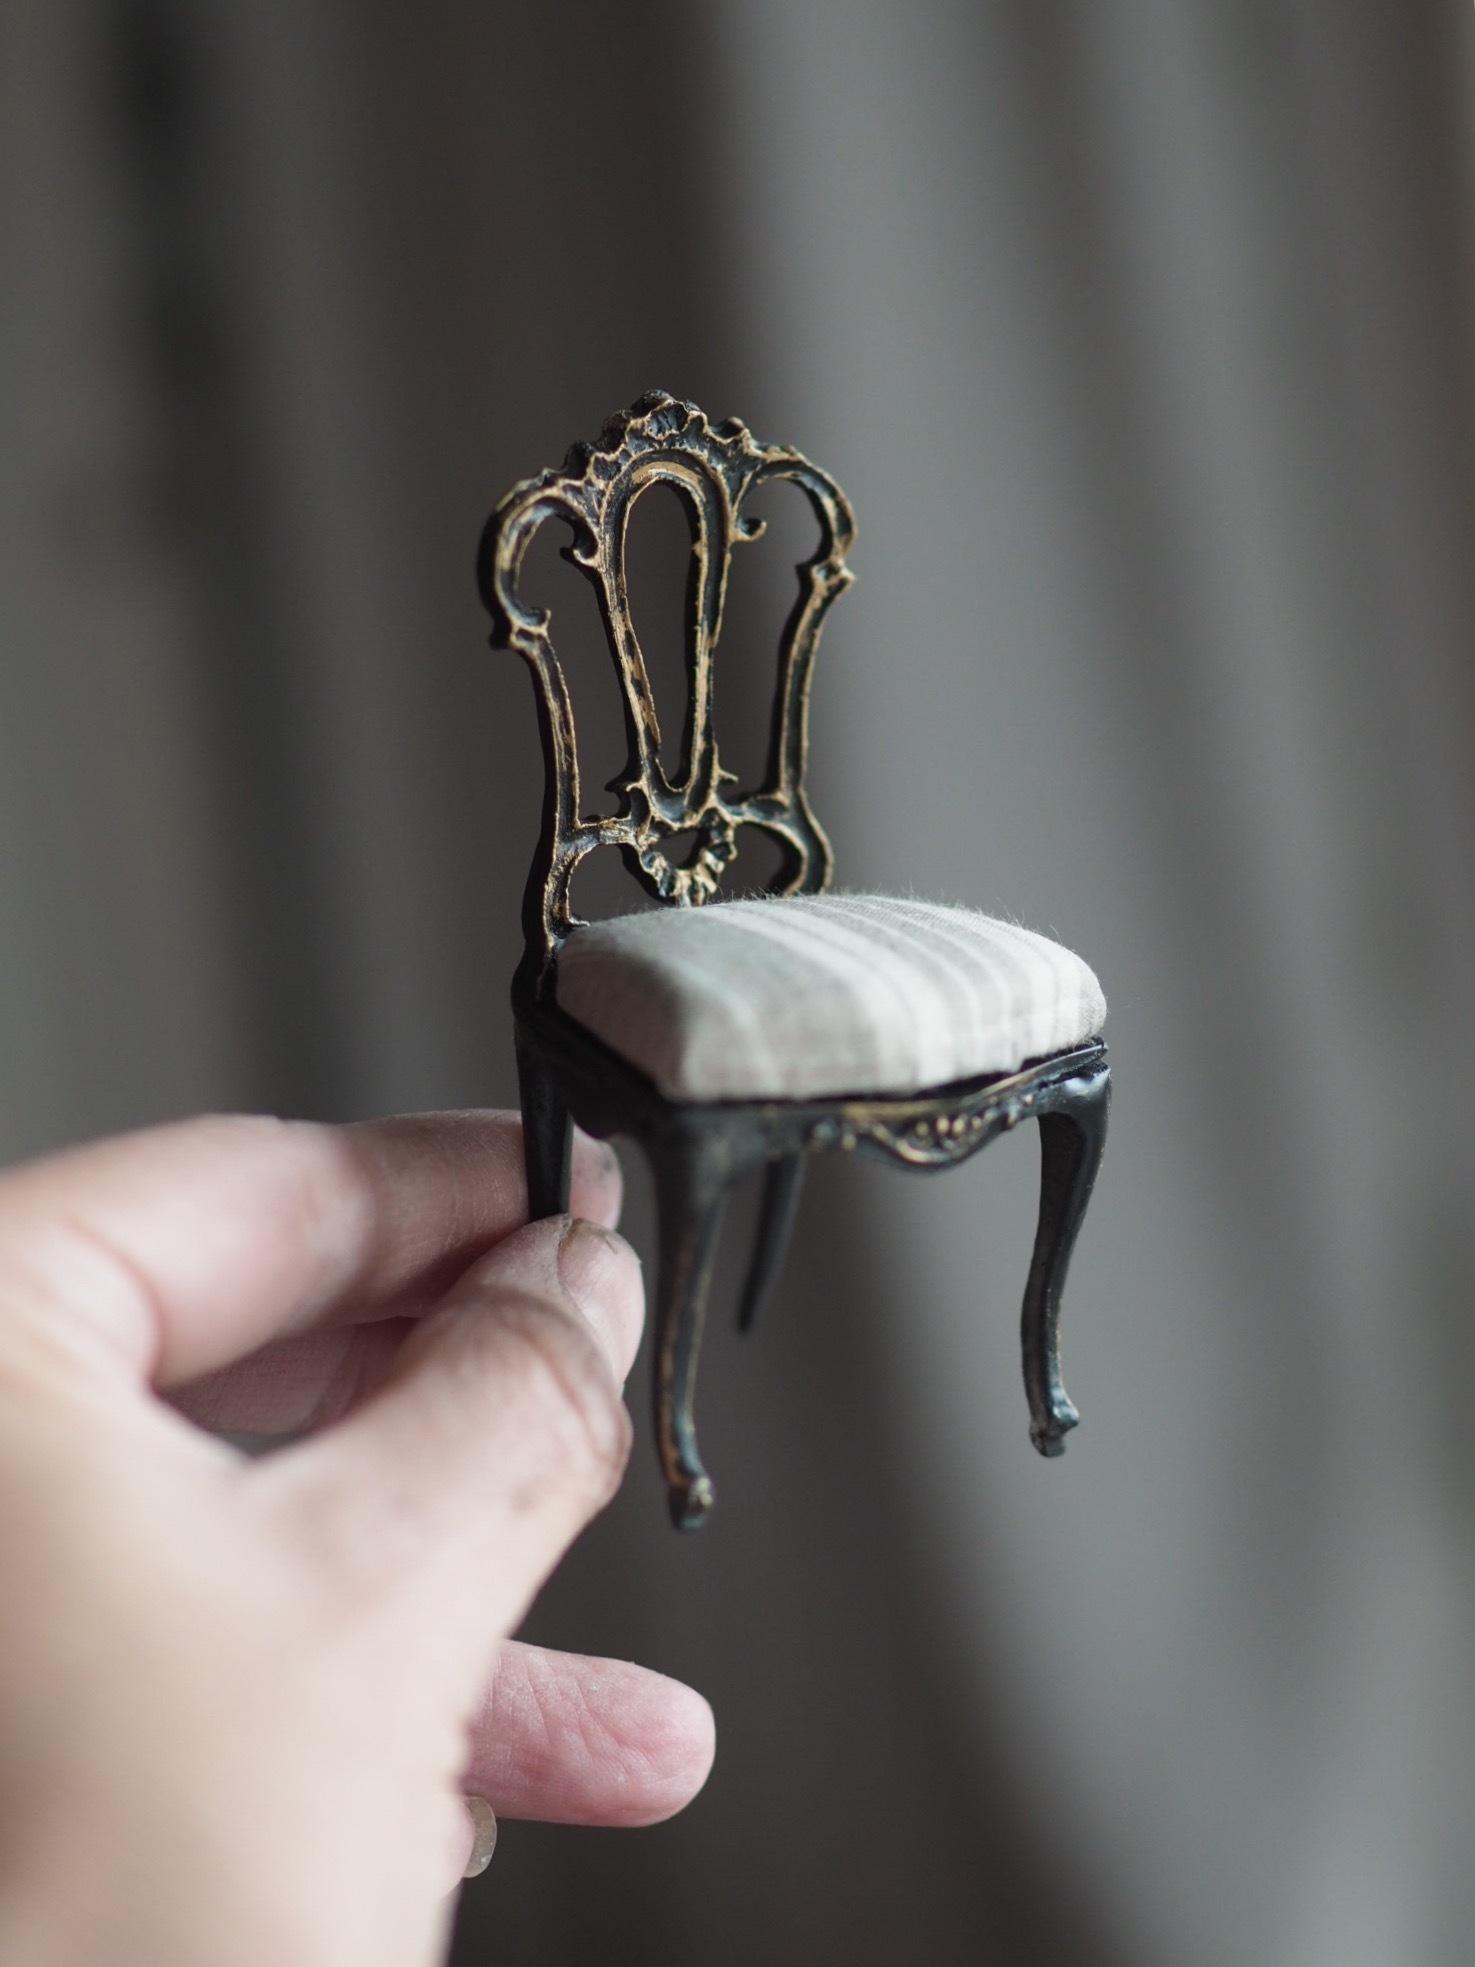 miniature*椅子_e0172847_09064198.jpeg